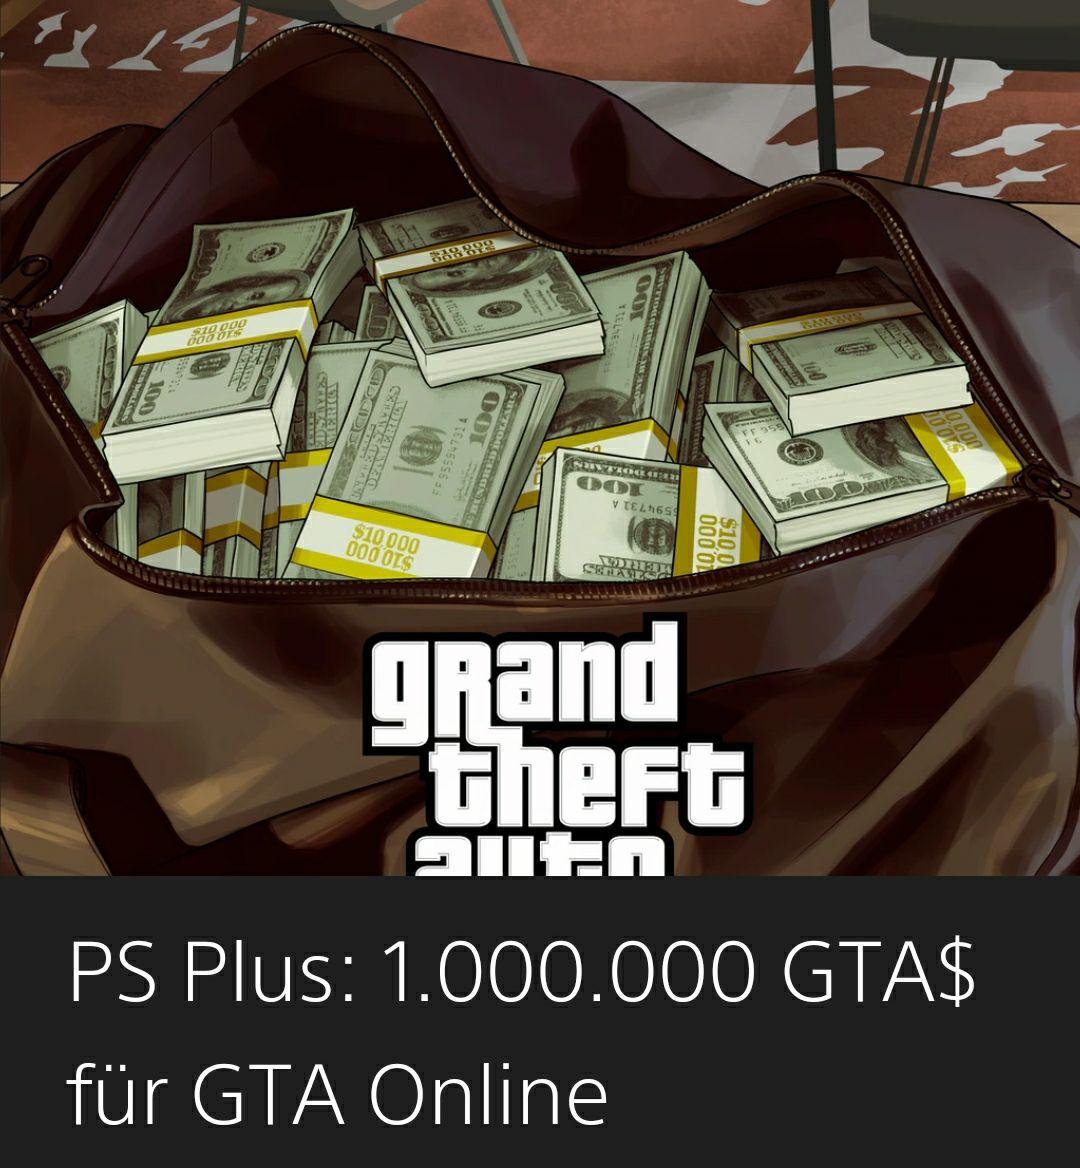 [PS+] 1.000.000 GTA$ für GTA Online (PS4) Kostenlos (PSN Store)